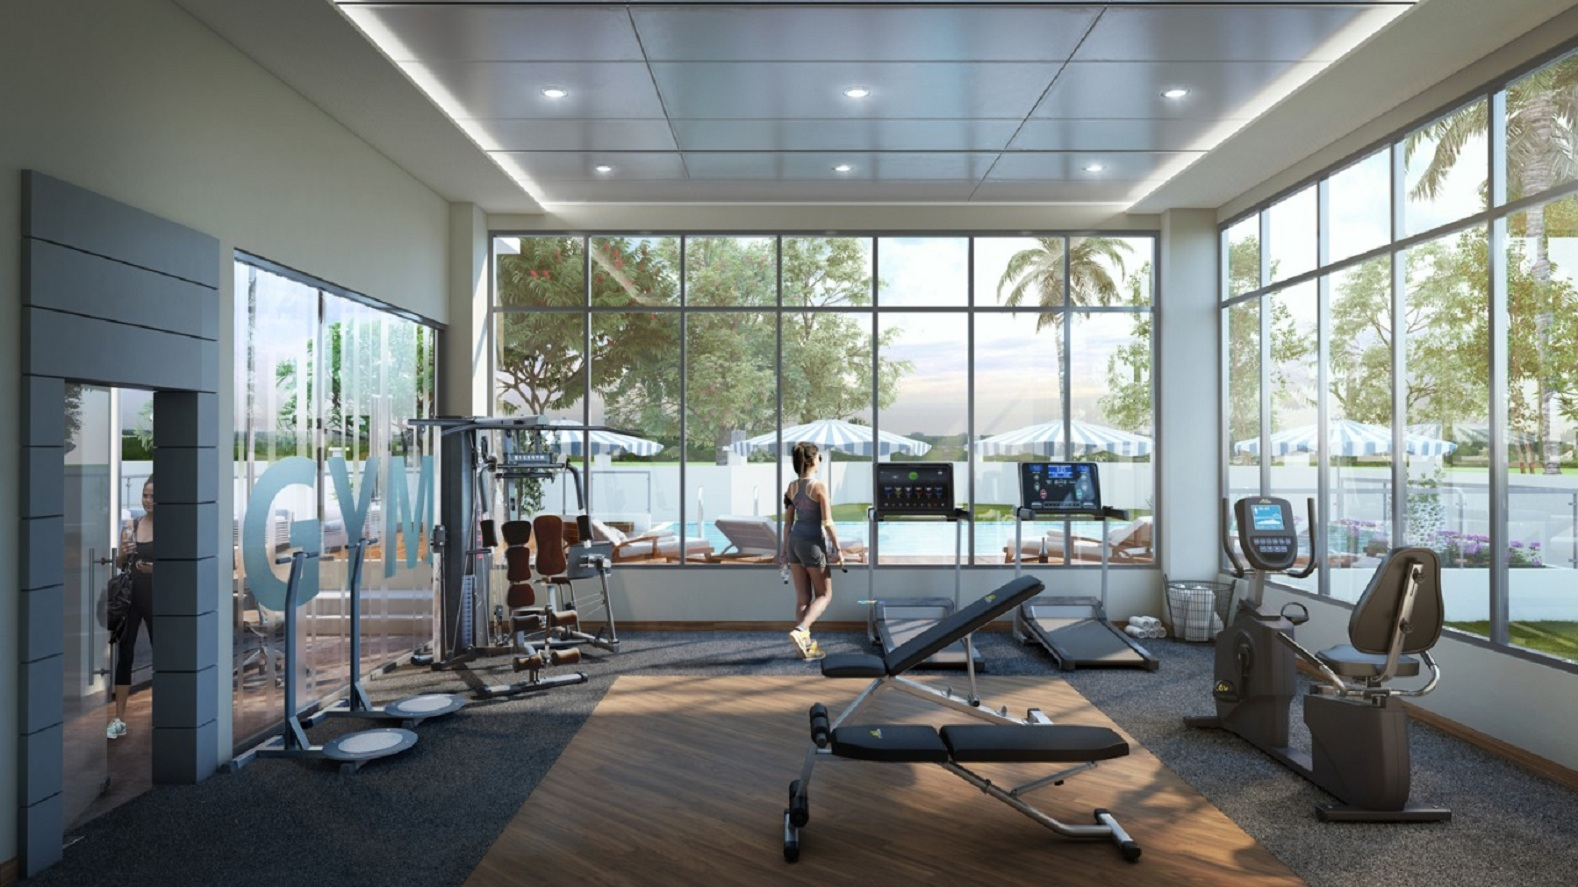 vijay khetan krishna residences project gymnasium image1